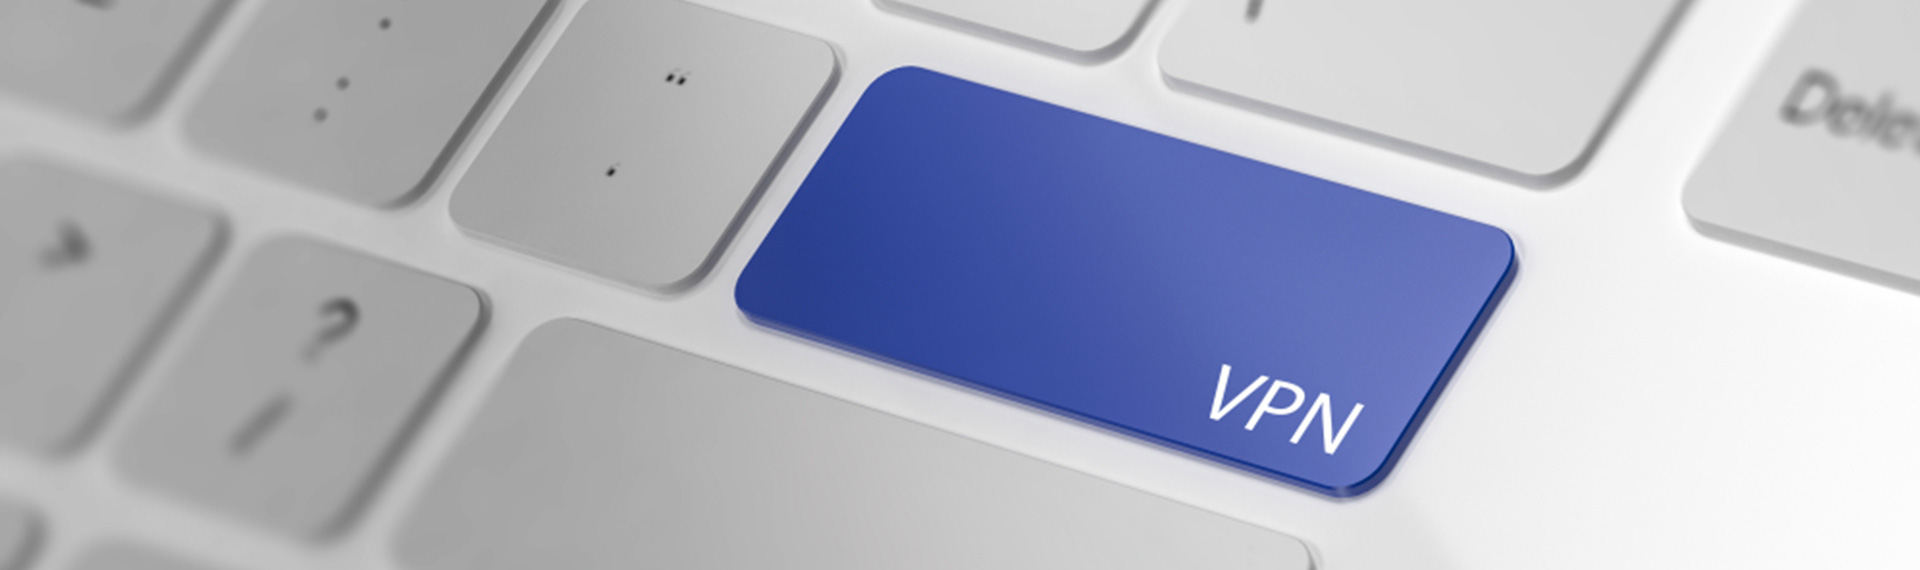 Cara Menggunakan VPN untuk Keamanan Data di Internet